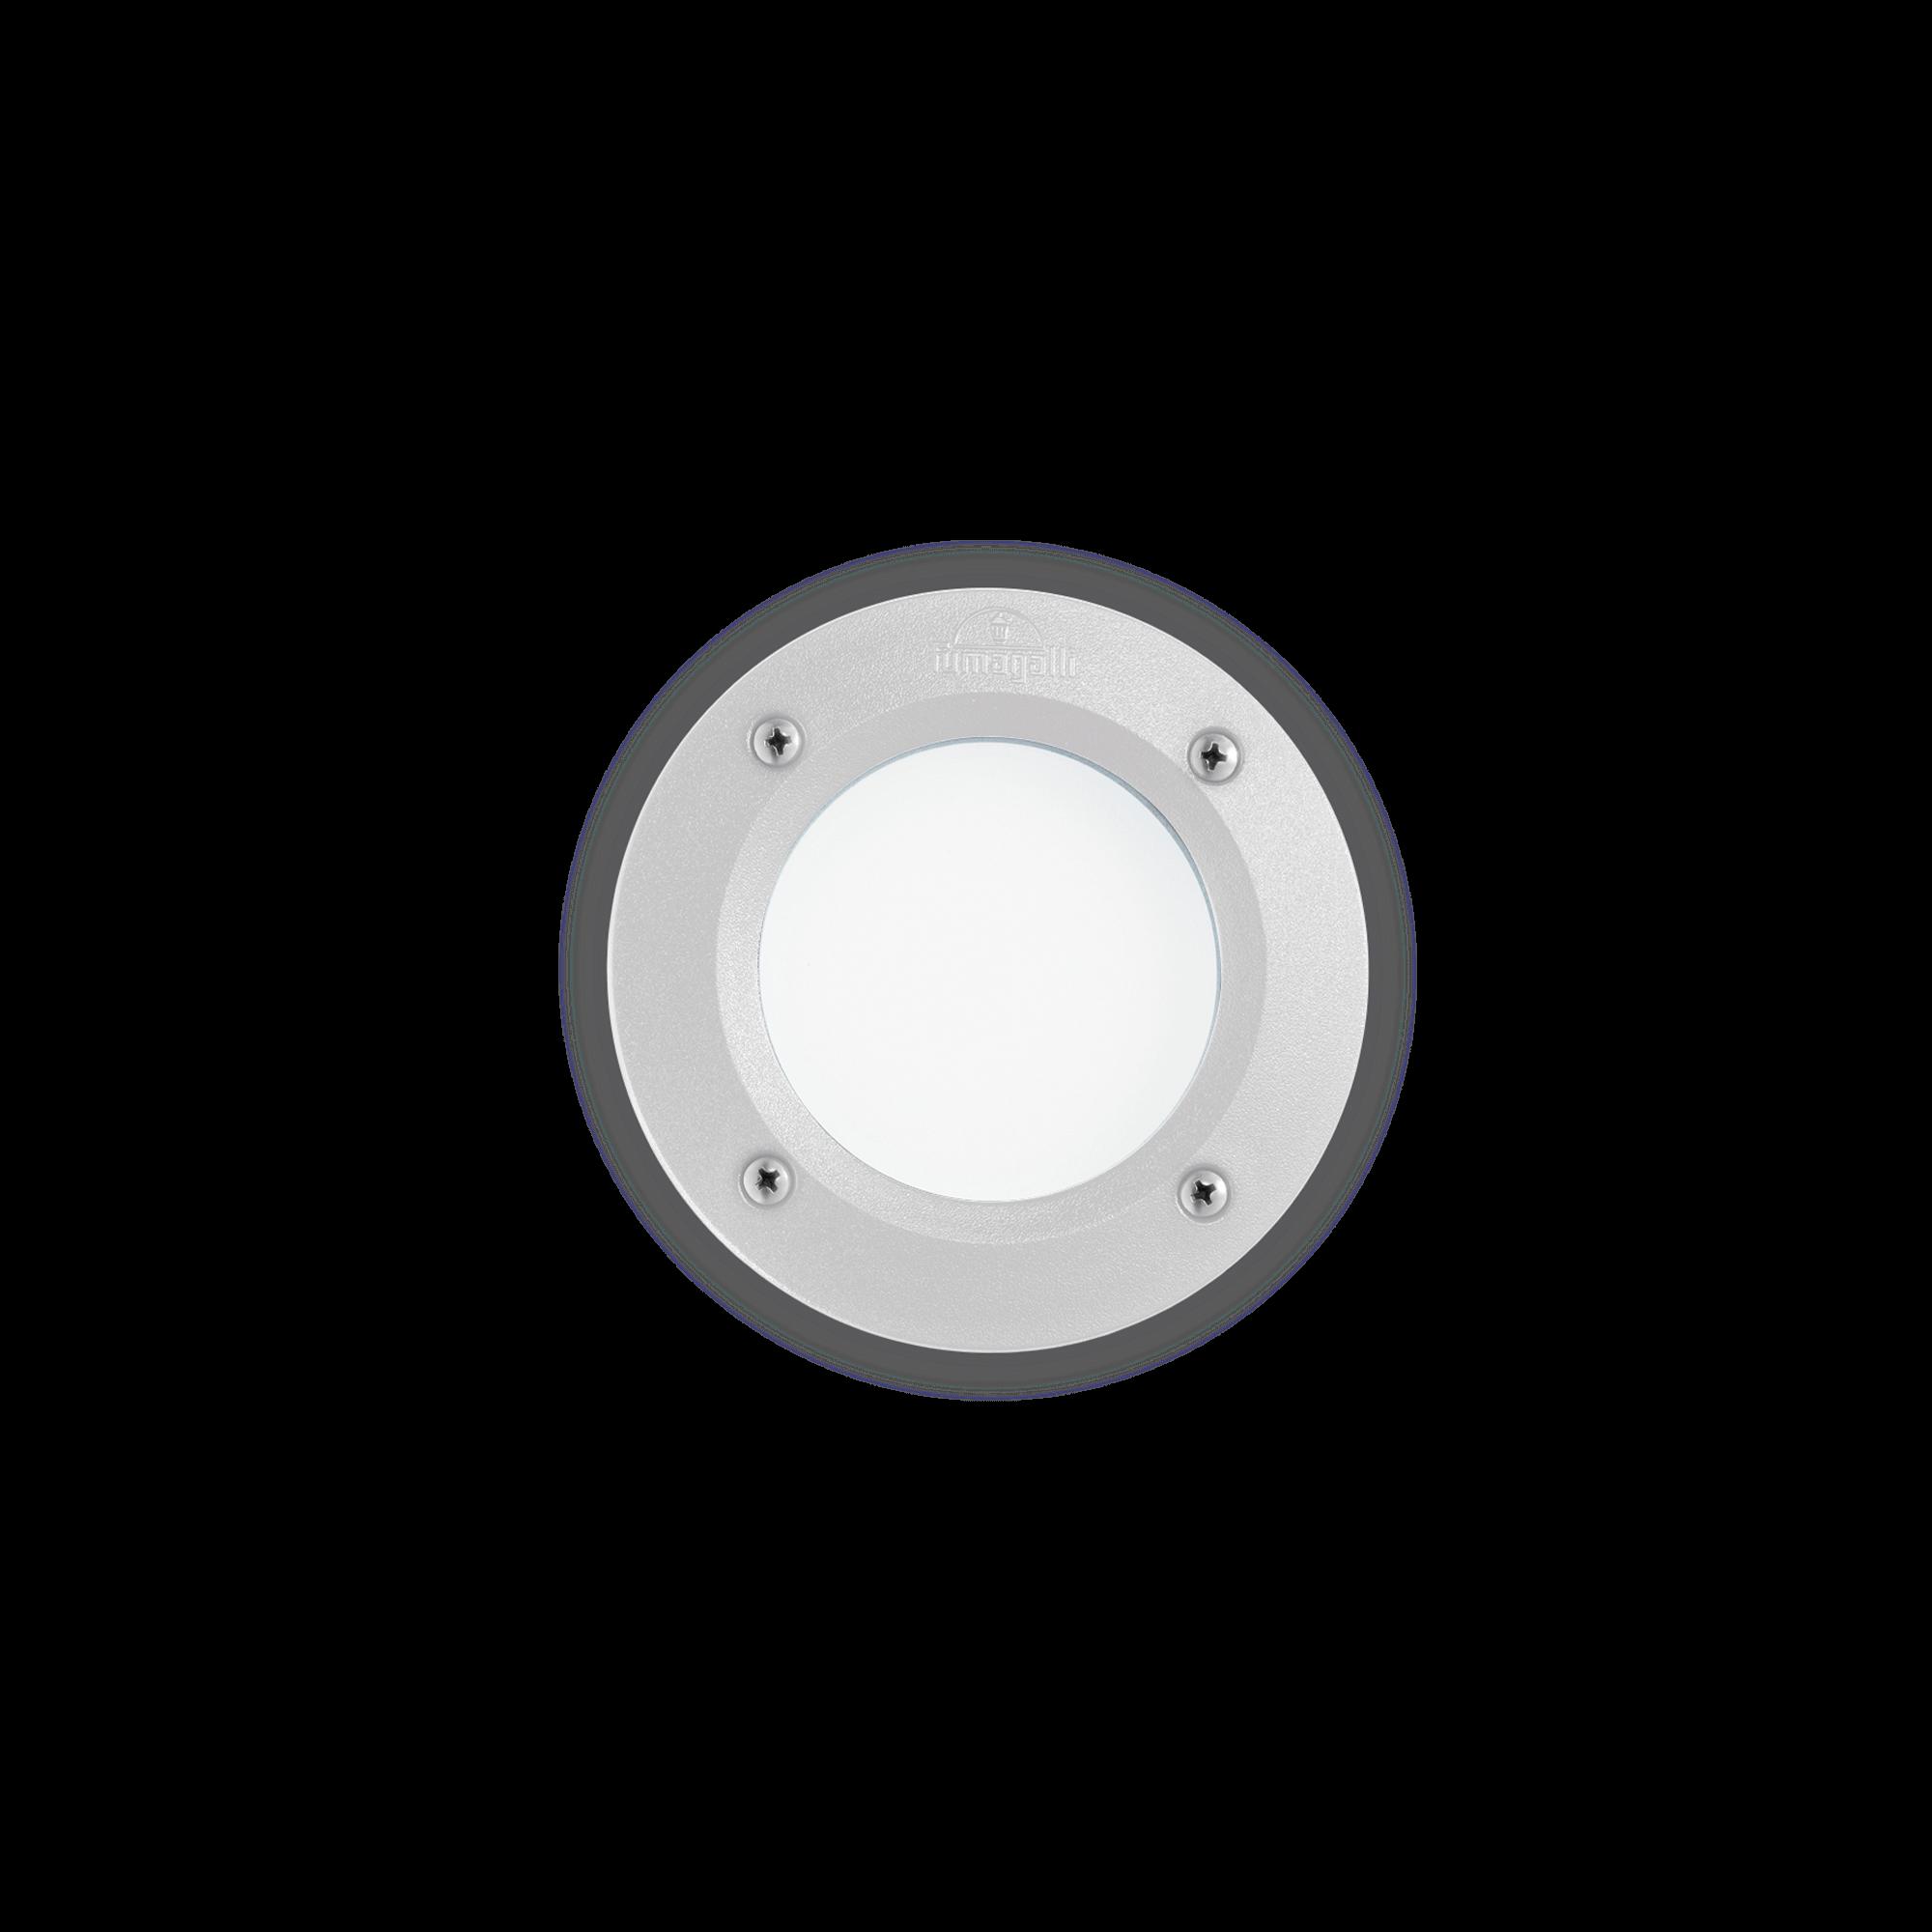 Exteriérové zápustné svítidlo Ideal lux 096544 LETI PT1 ROUND BIANCO 1xGX53 23W 4000K IP66